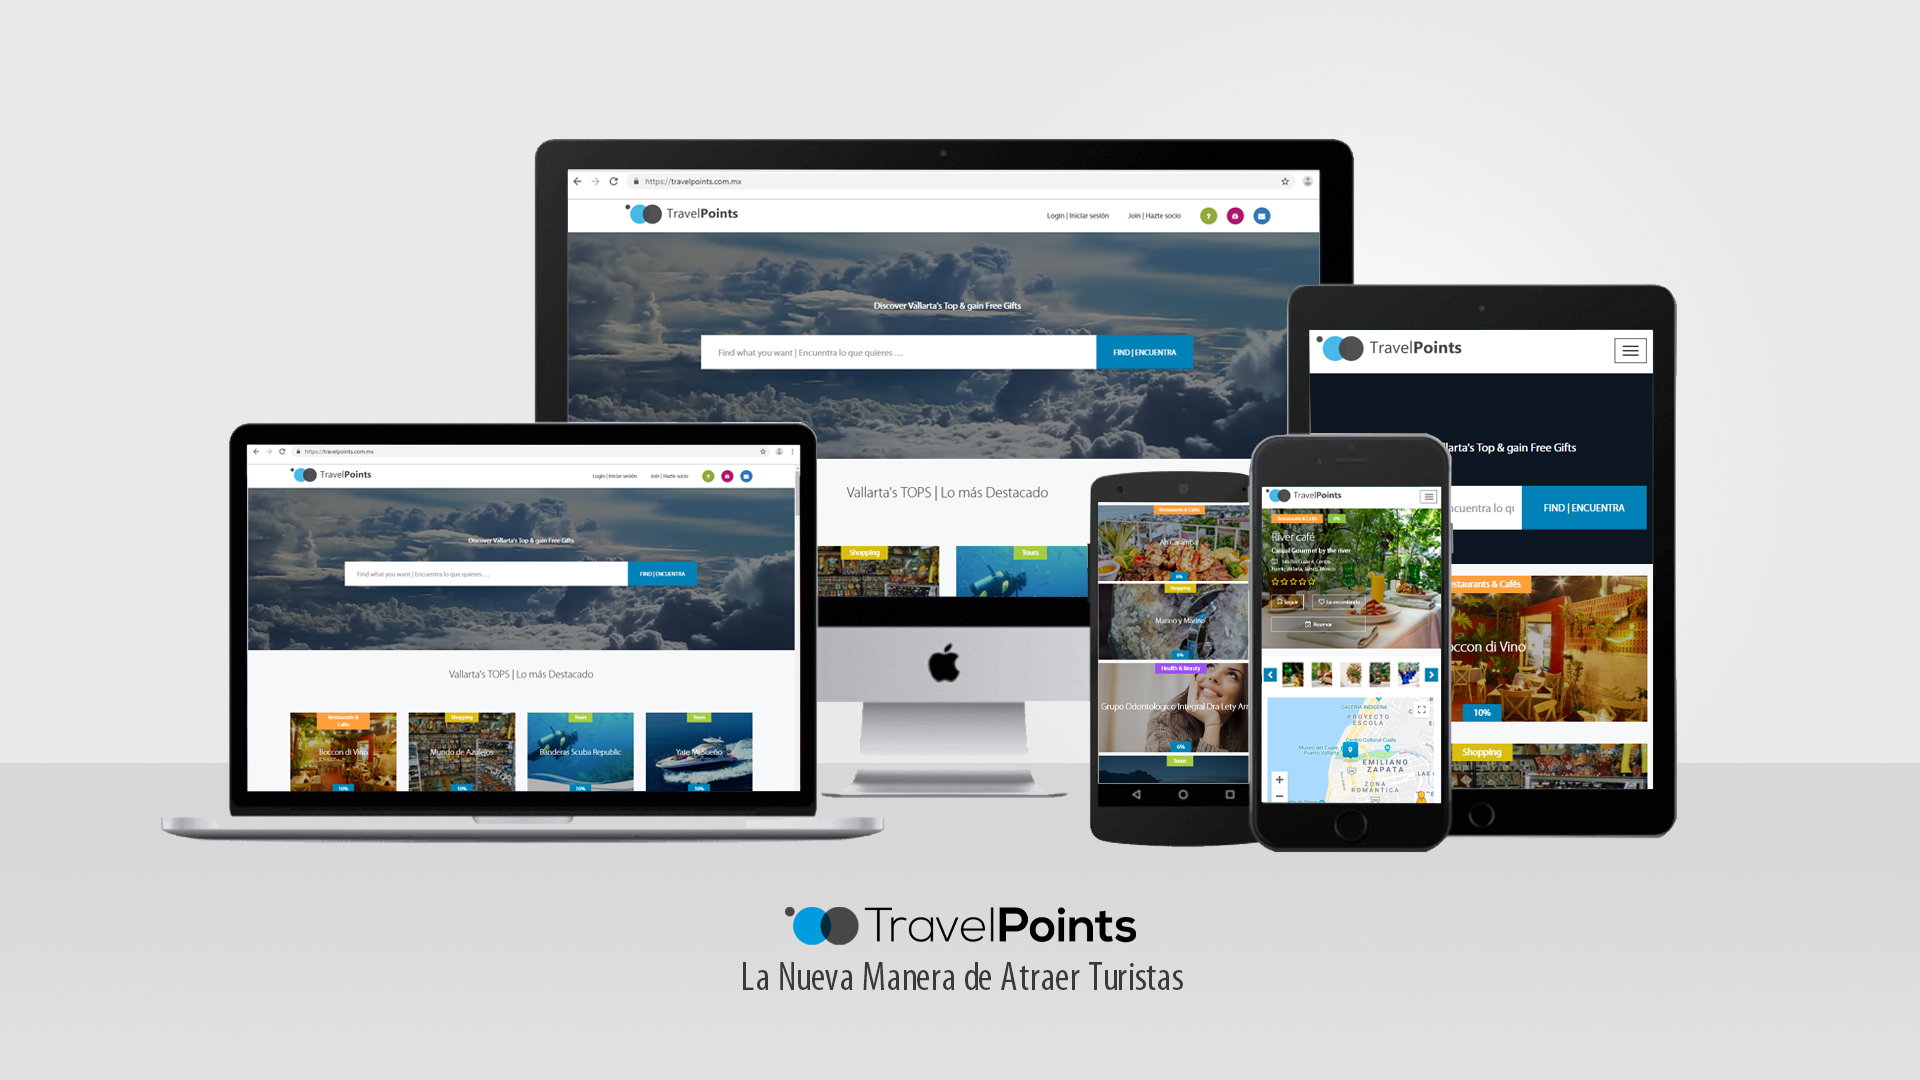 00 Travel Points diapositiva power point presentacion hotel para anunciantes portada